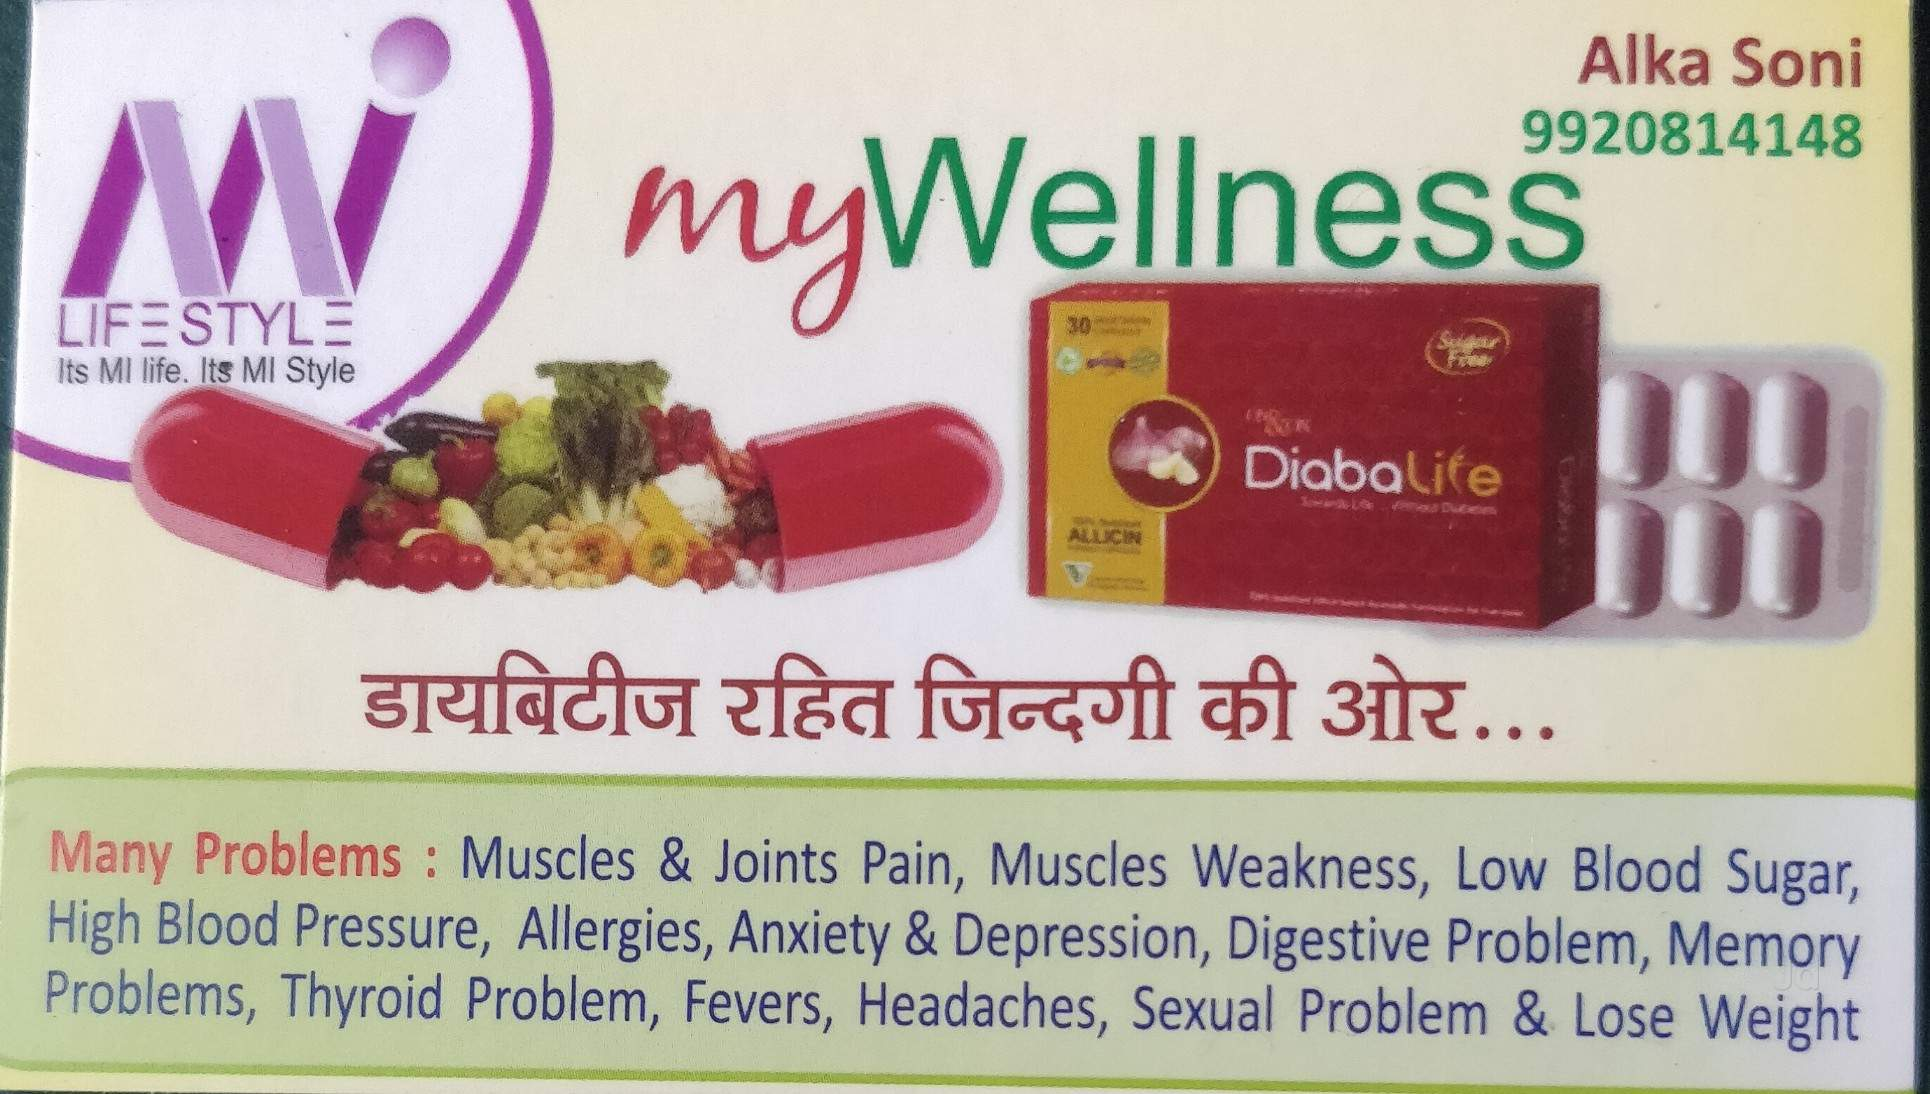 Top 30 Ayurvedic Medicine Shops in Dadar West - Best